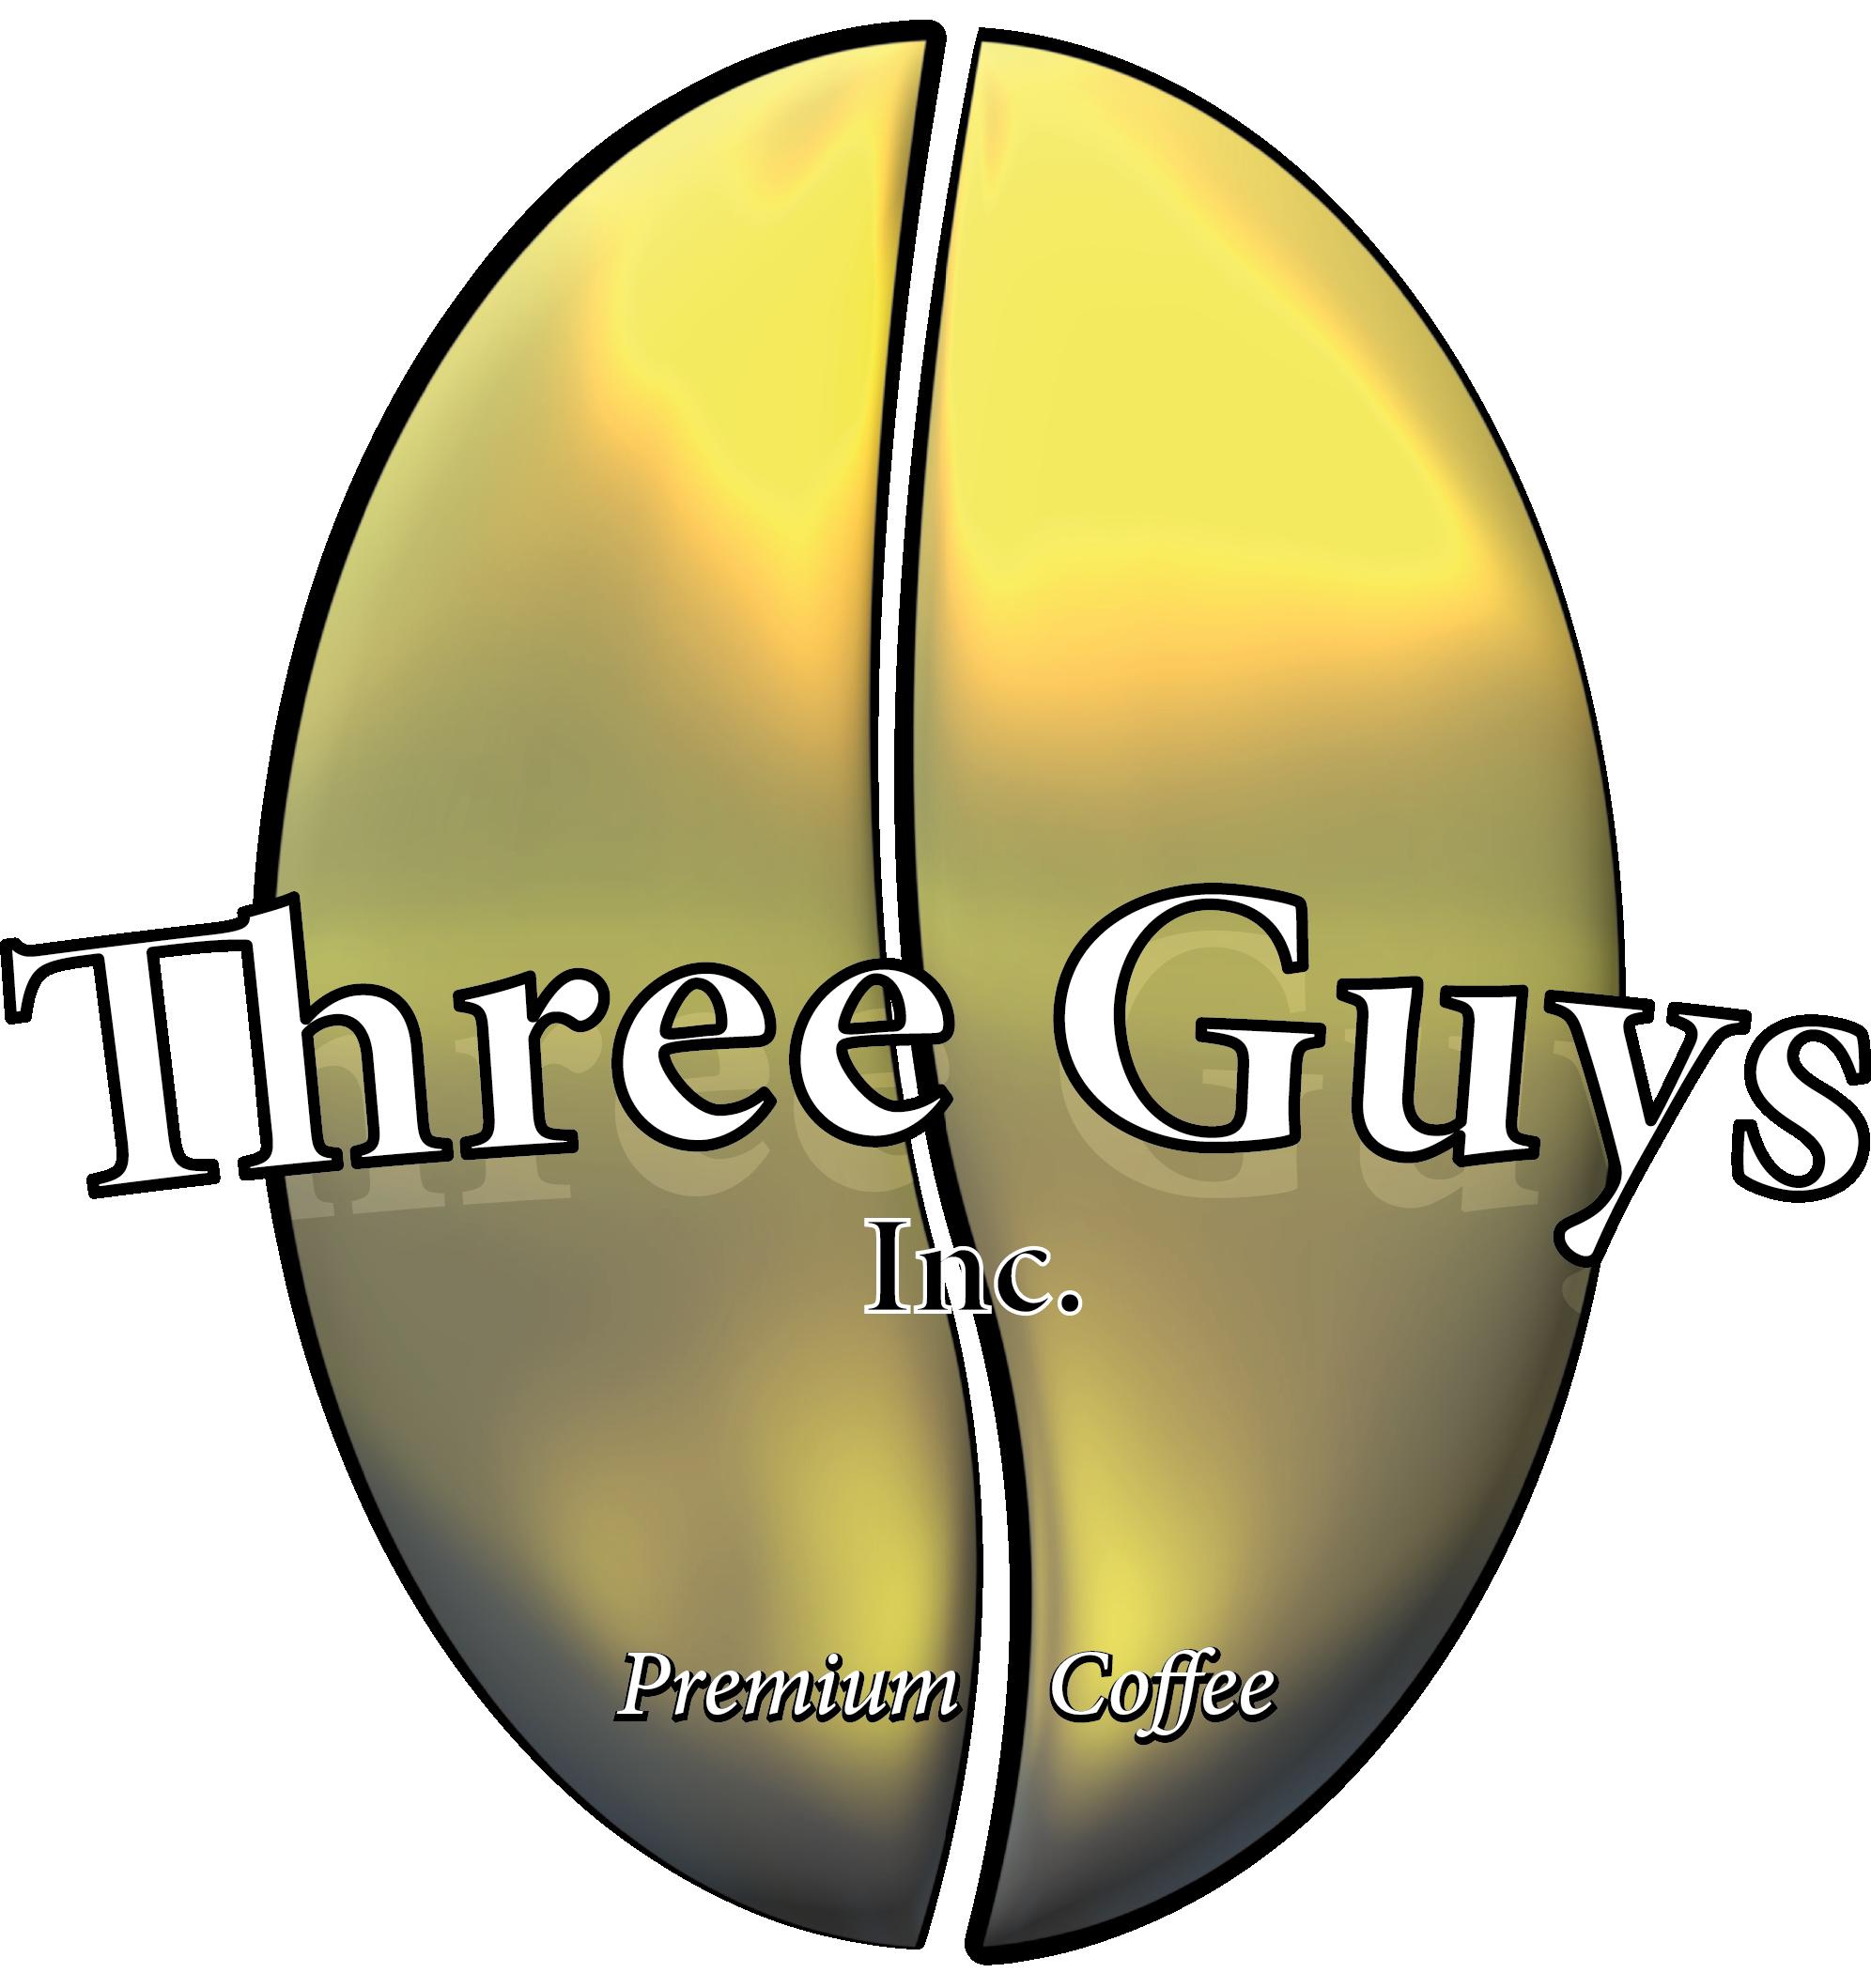 3 Guys_3ra propuesta